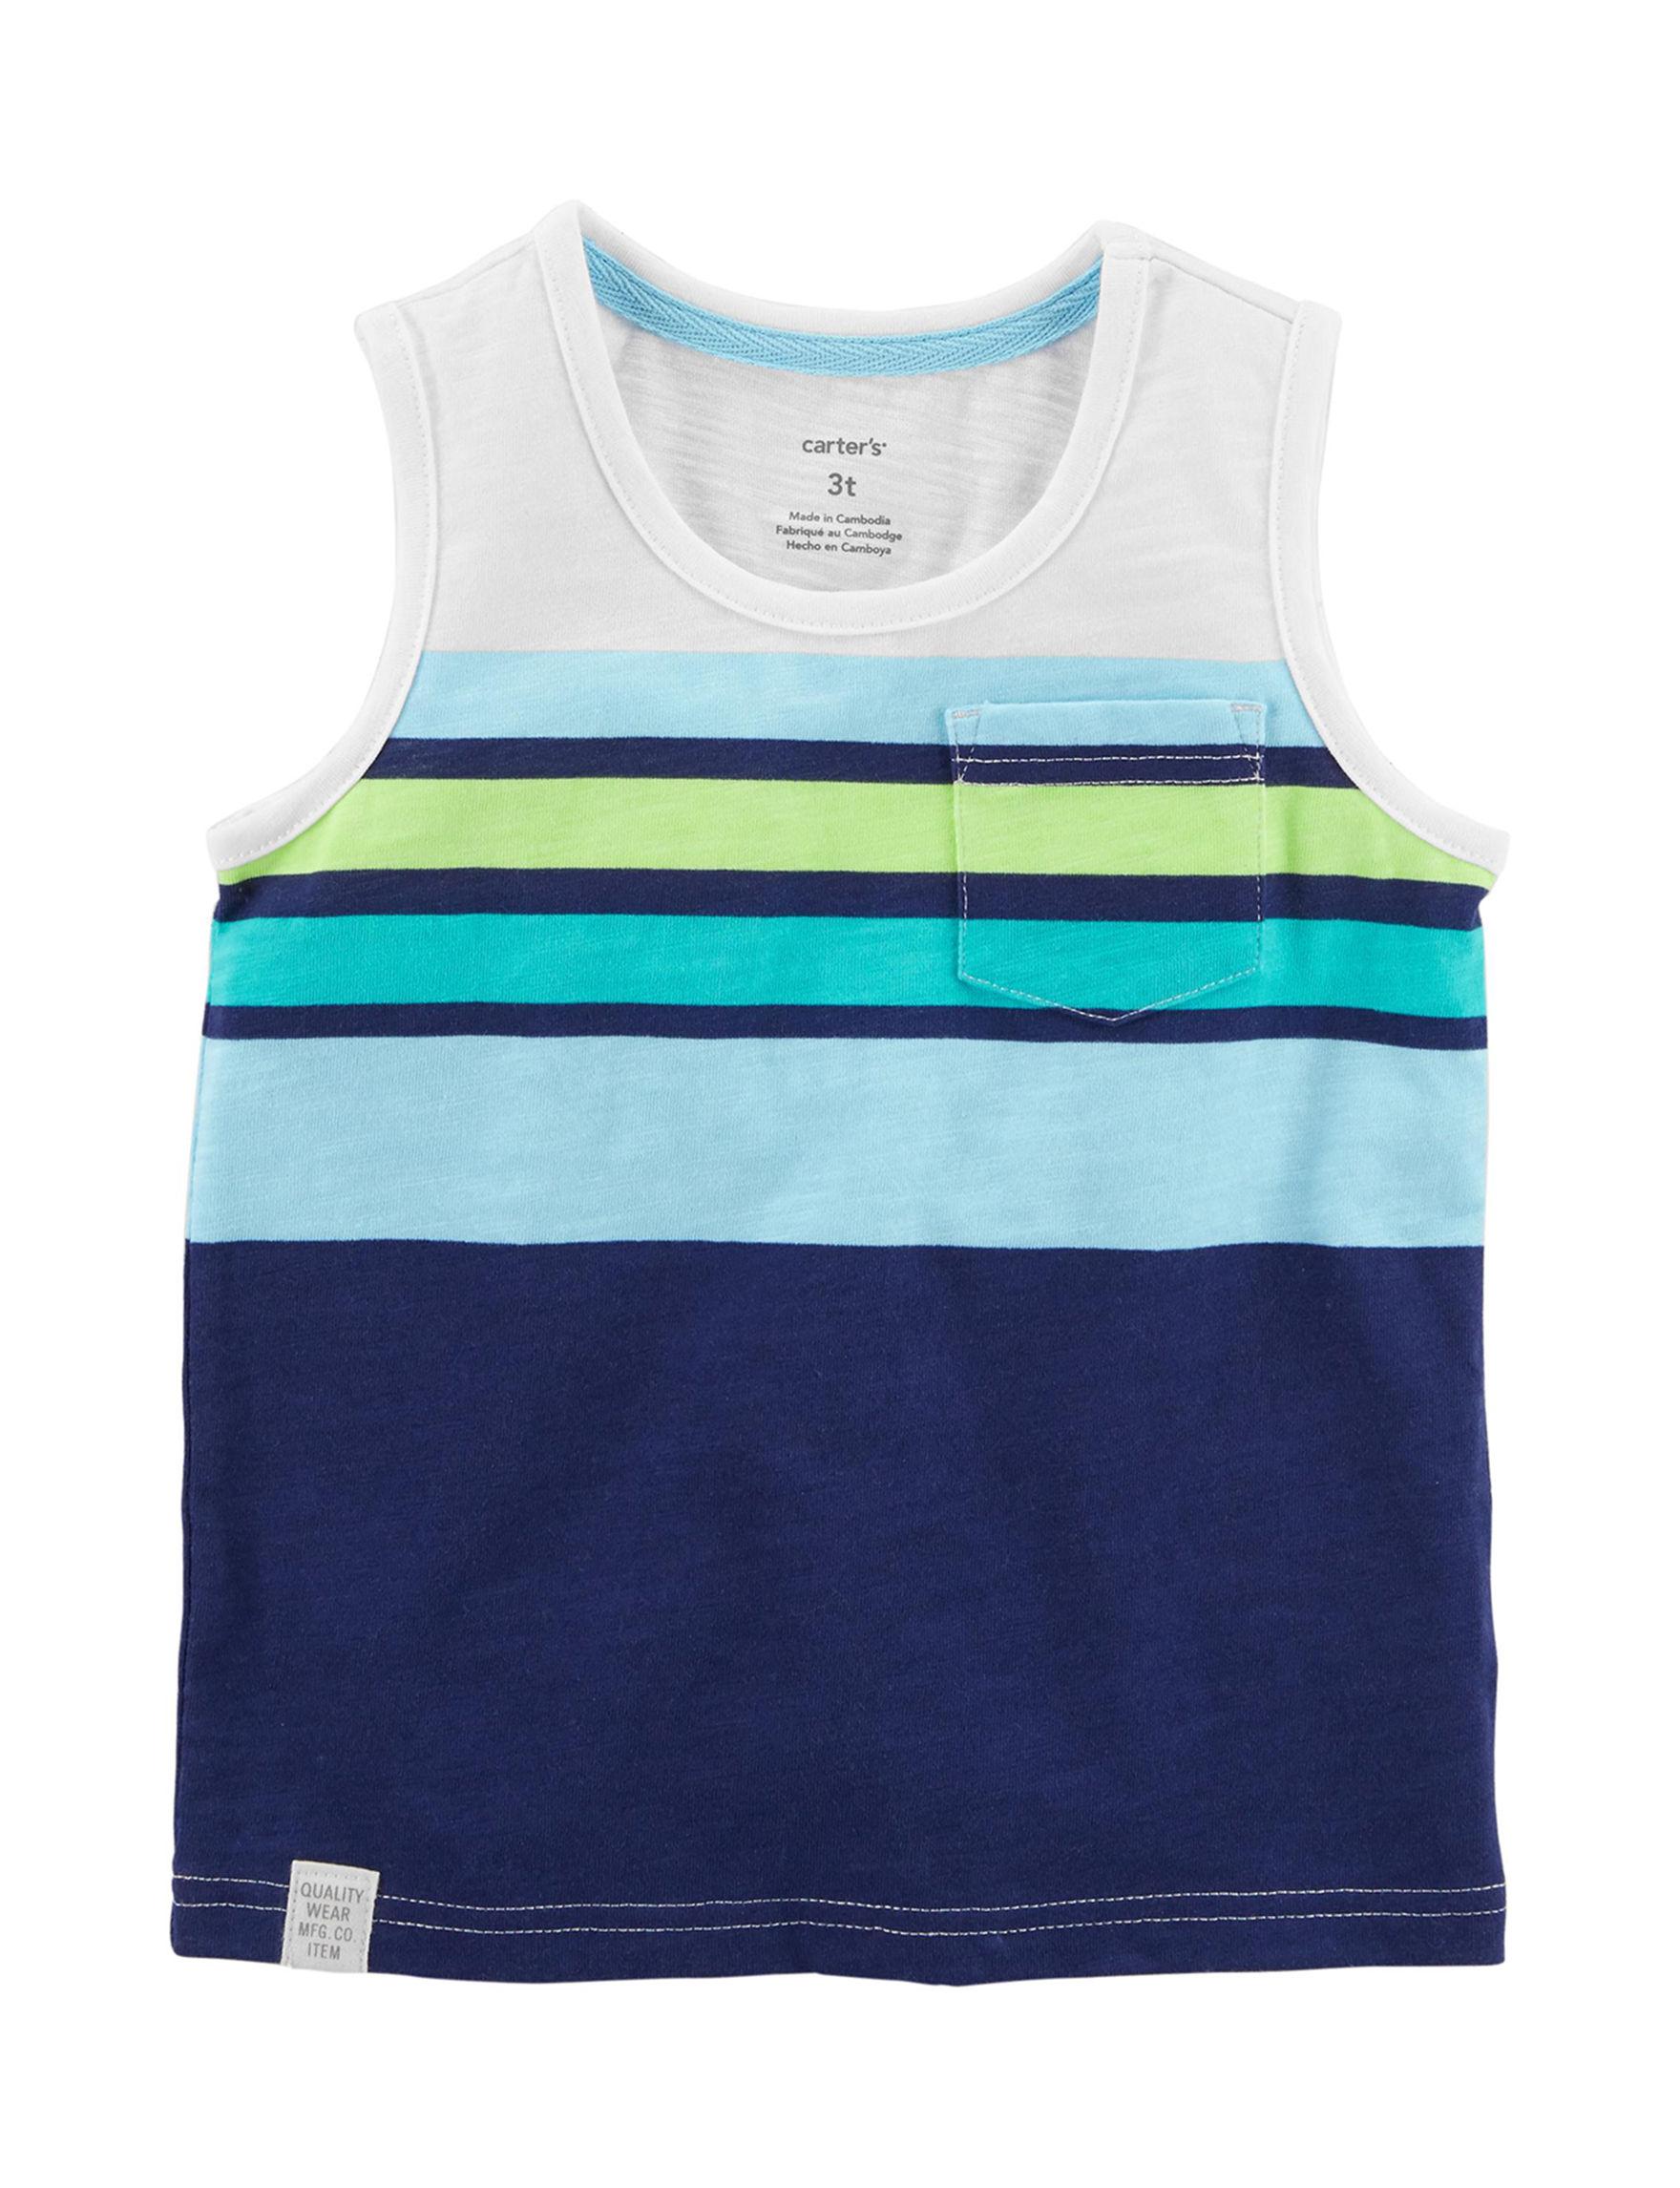 Carter's Blue Stripe Tees & Tanks